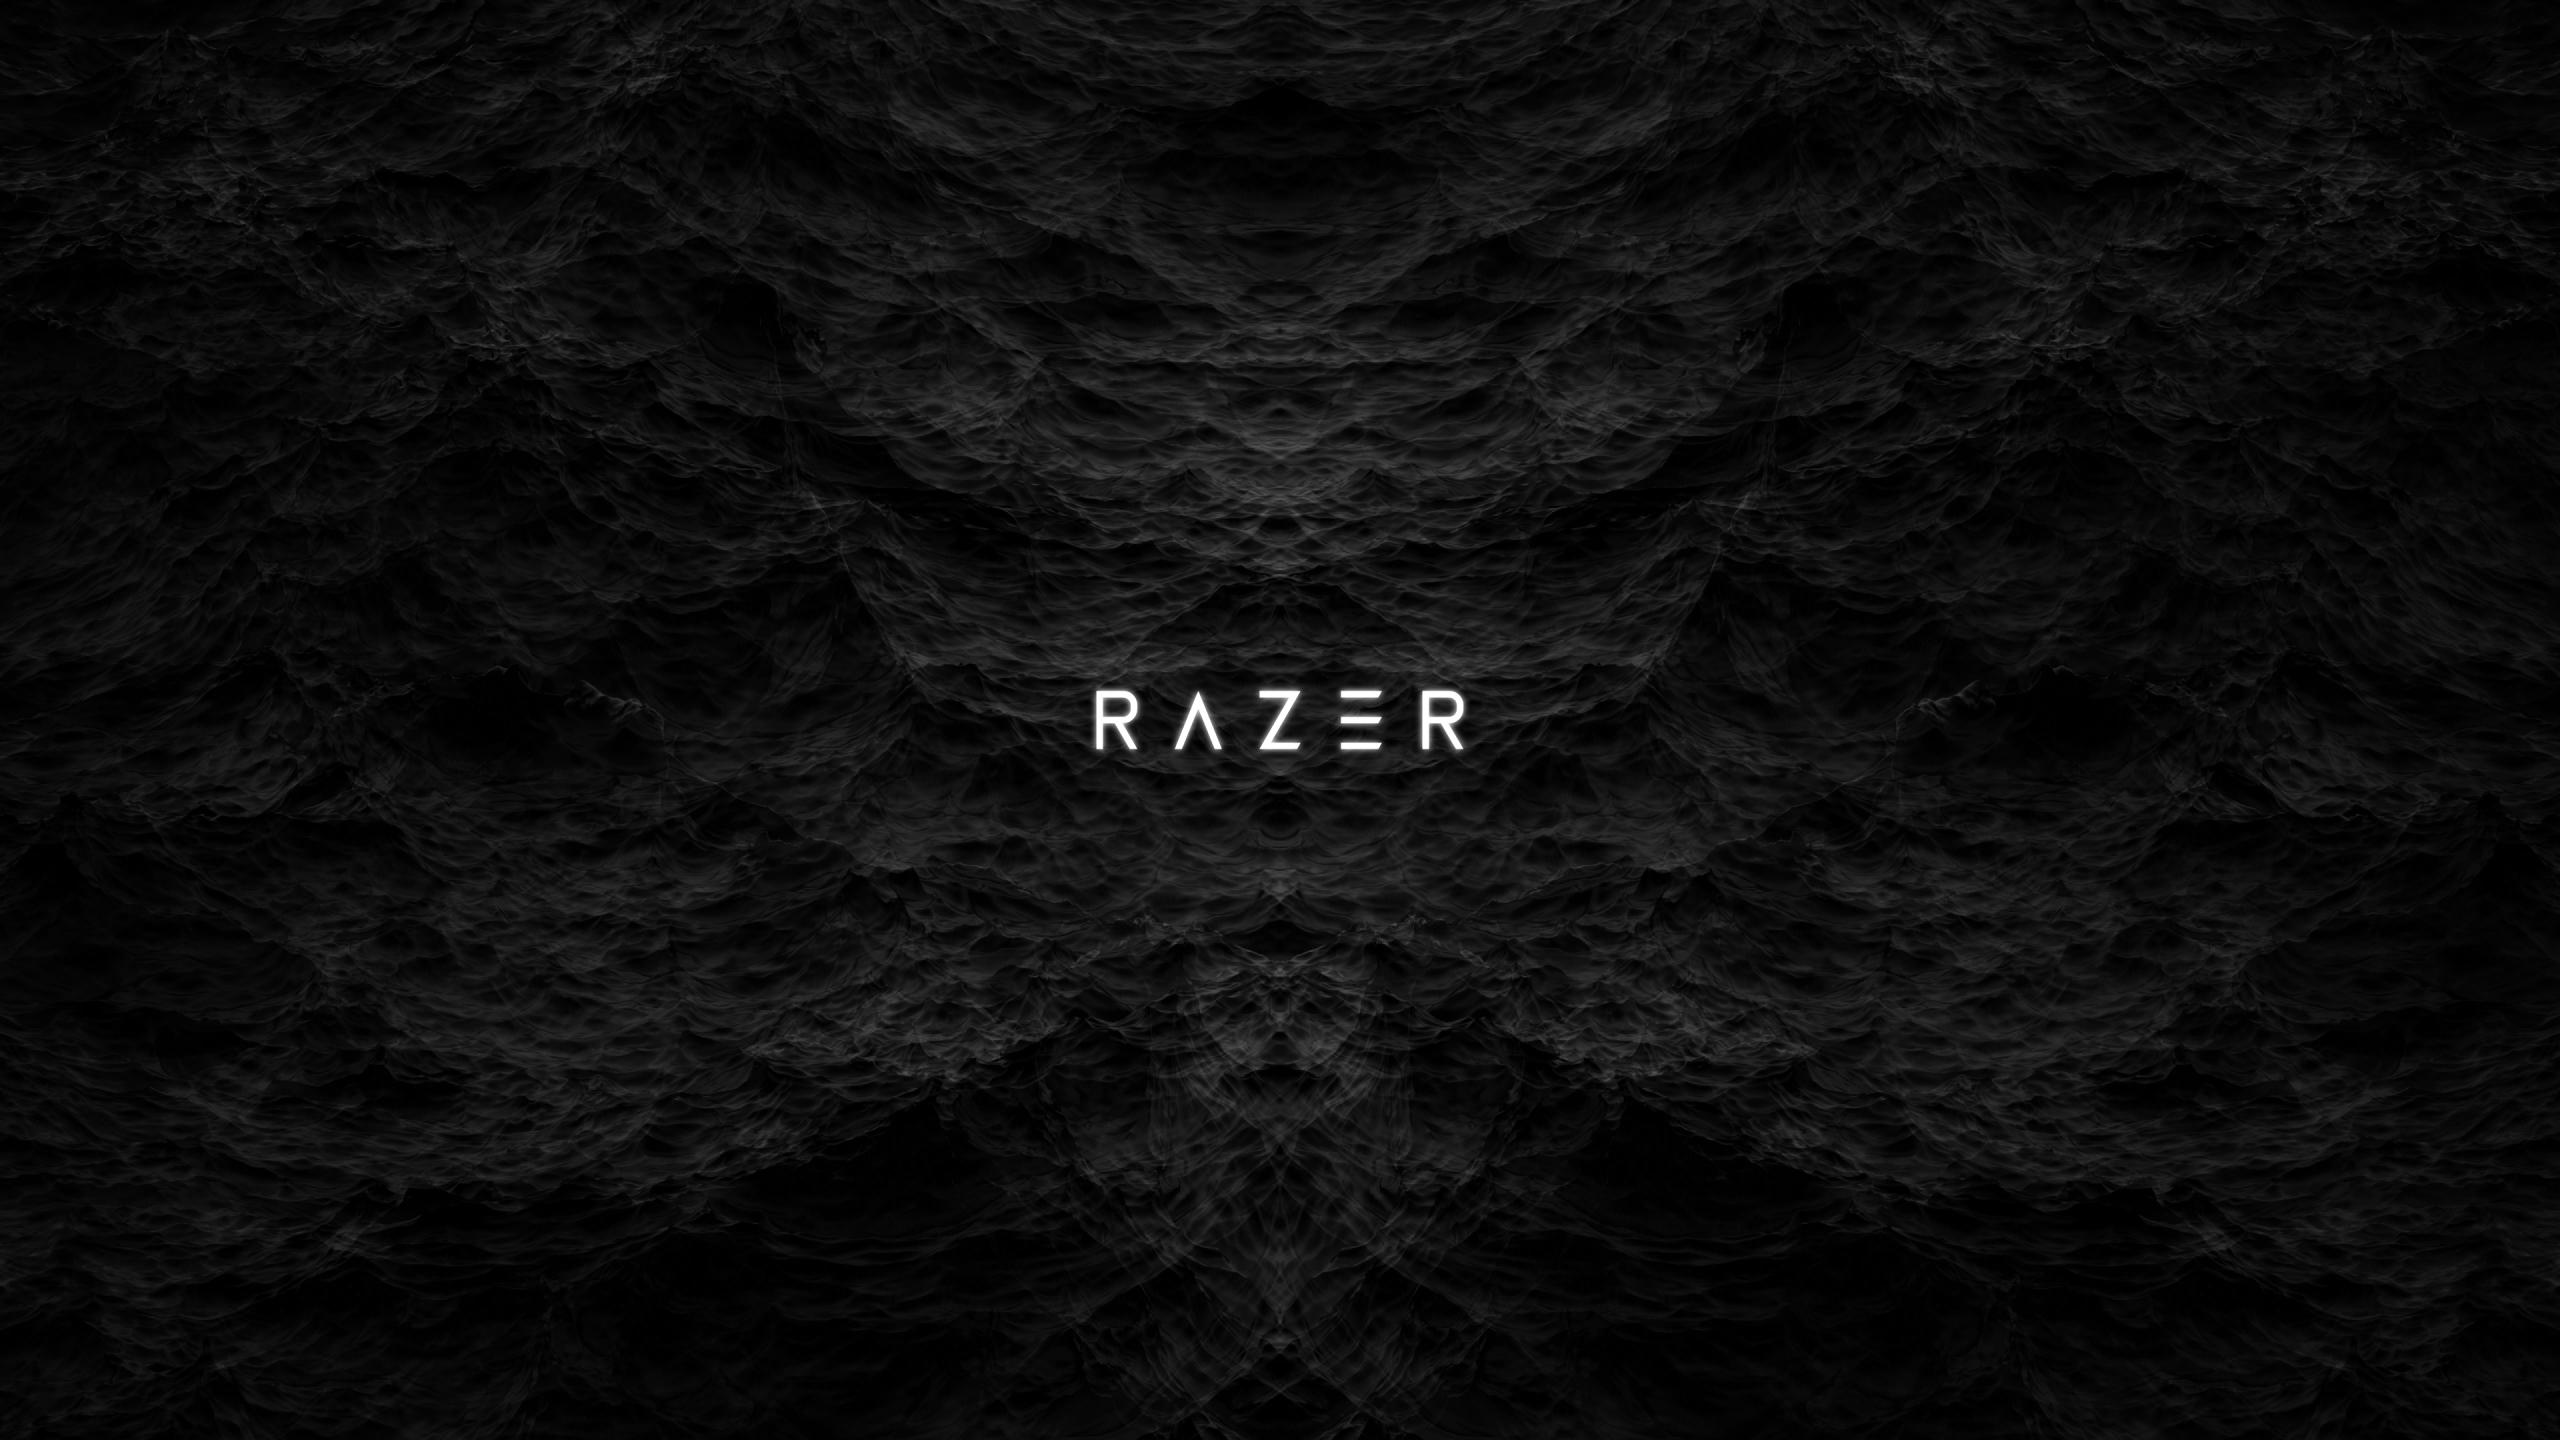 2560x1440 Razer 4K 1440P Resolution